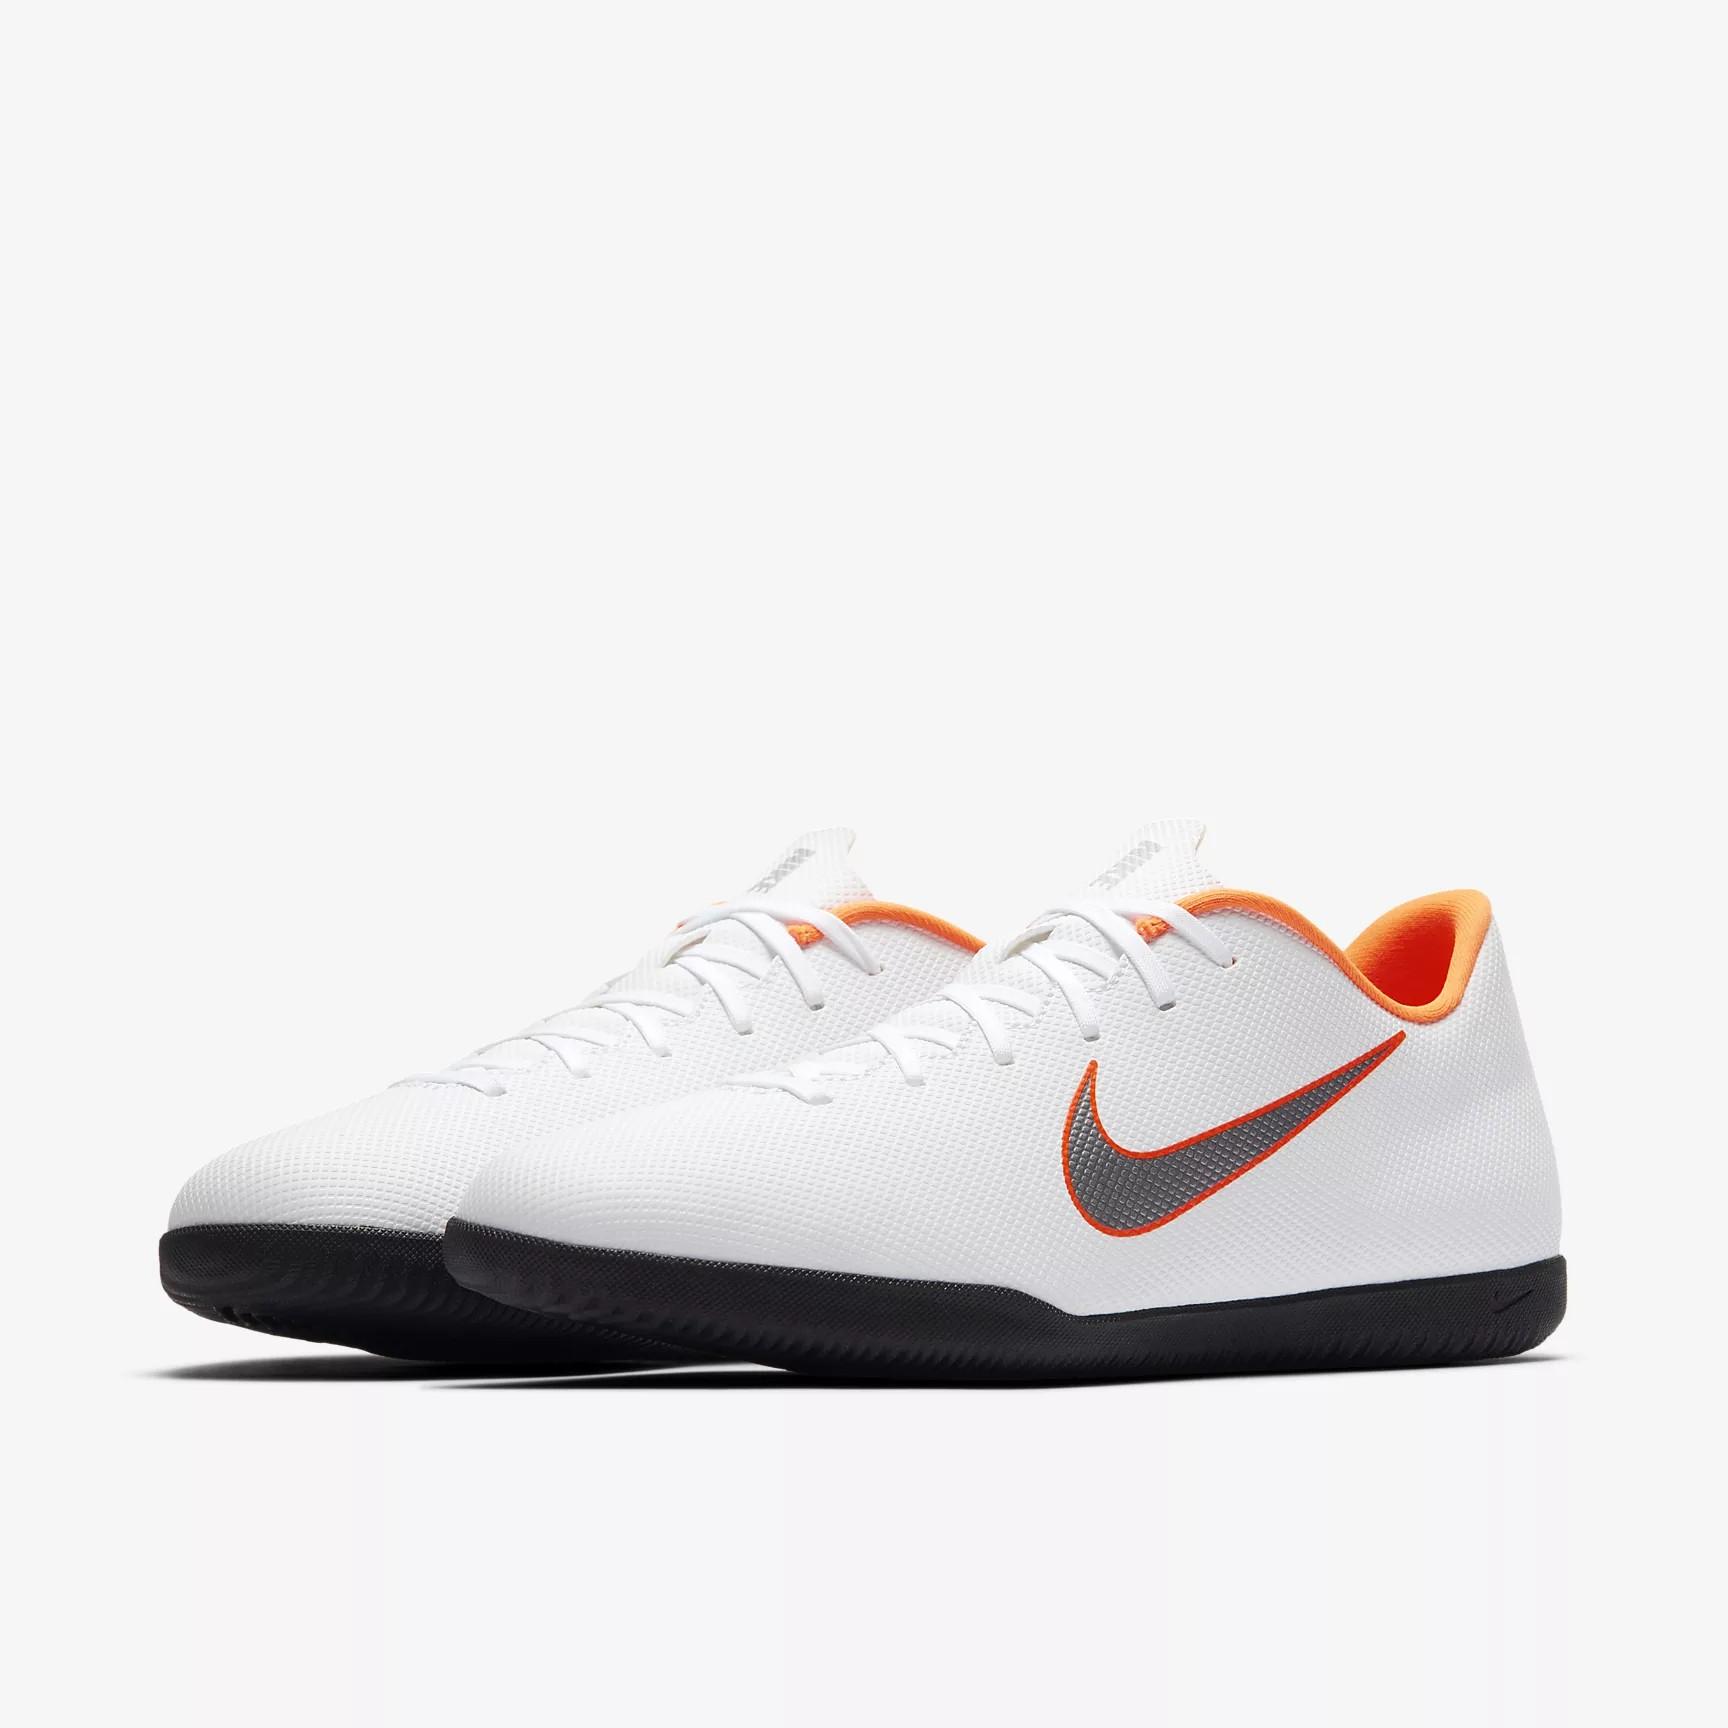 ... Click to enlarge image  nike mercurialx vapor xii pro ic just do it pack white total orange metallic cool grey metallic cool grey e.jpg  ... 5ba75933adb